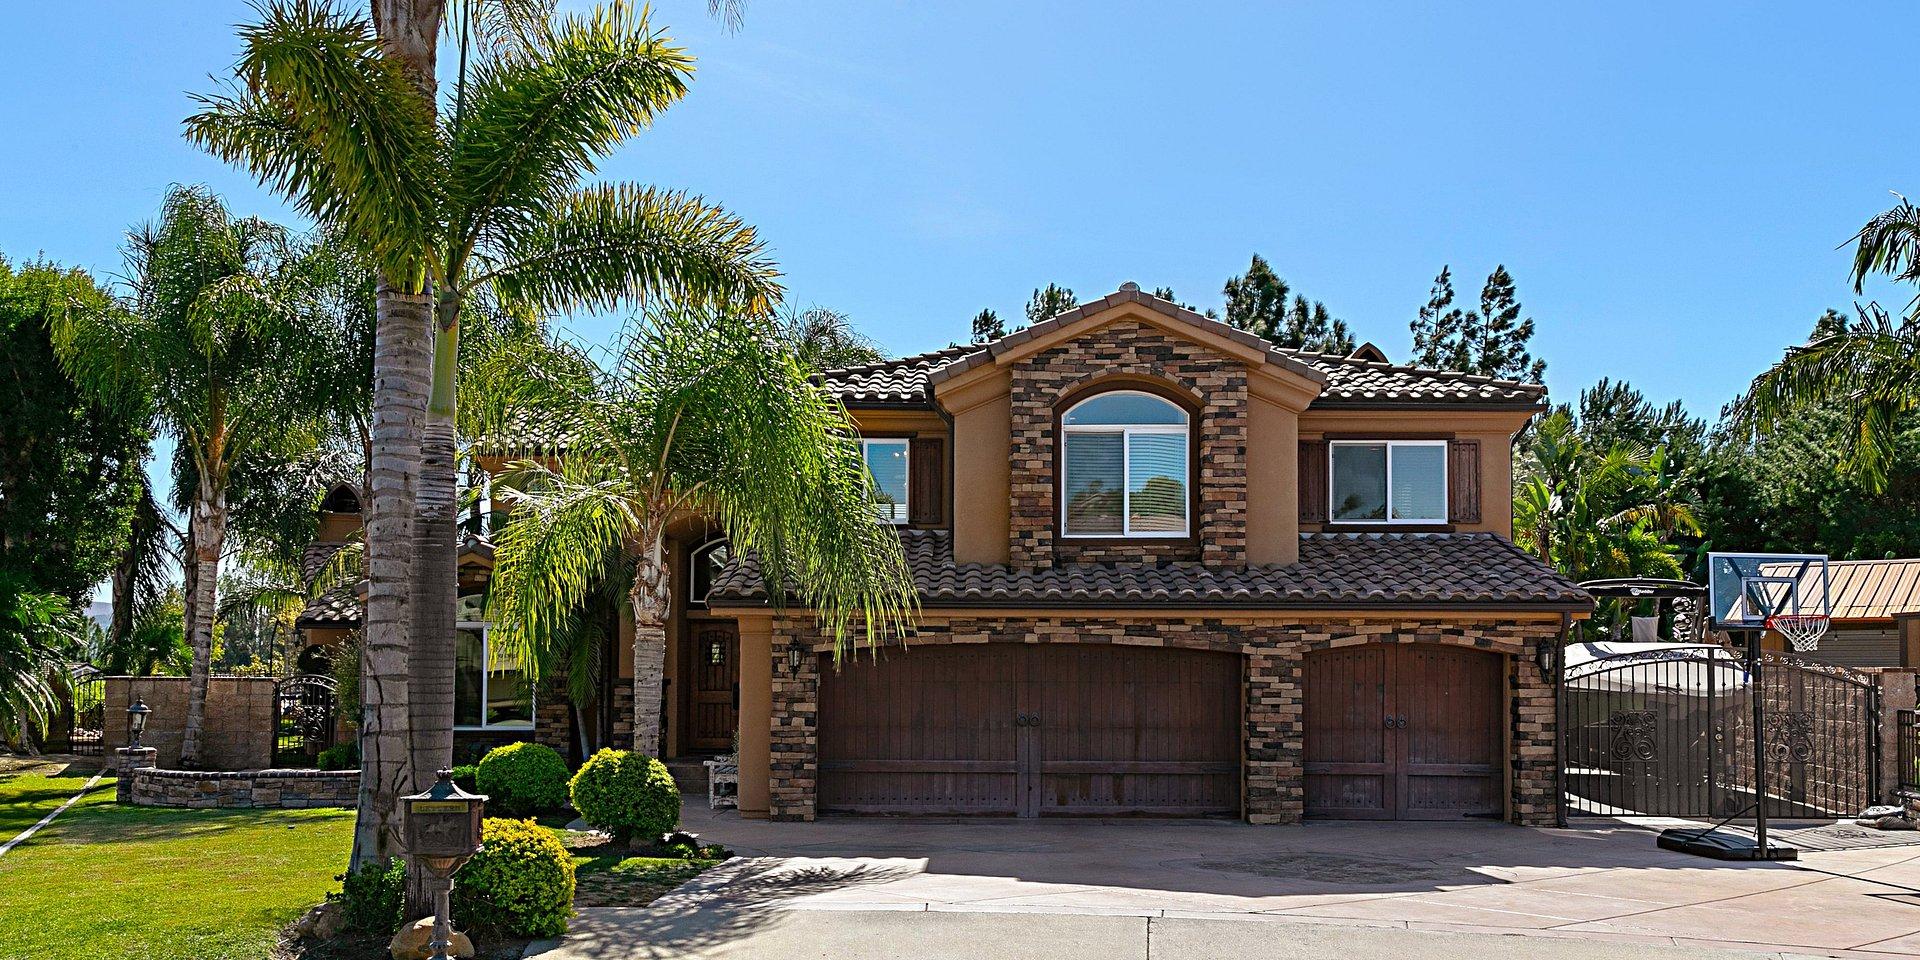 Coldwell Banker Residential Brokerage Lists Yorba Linda Property for $1.399 Million